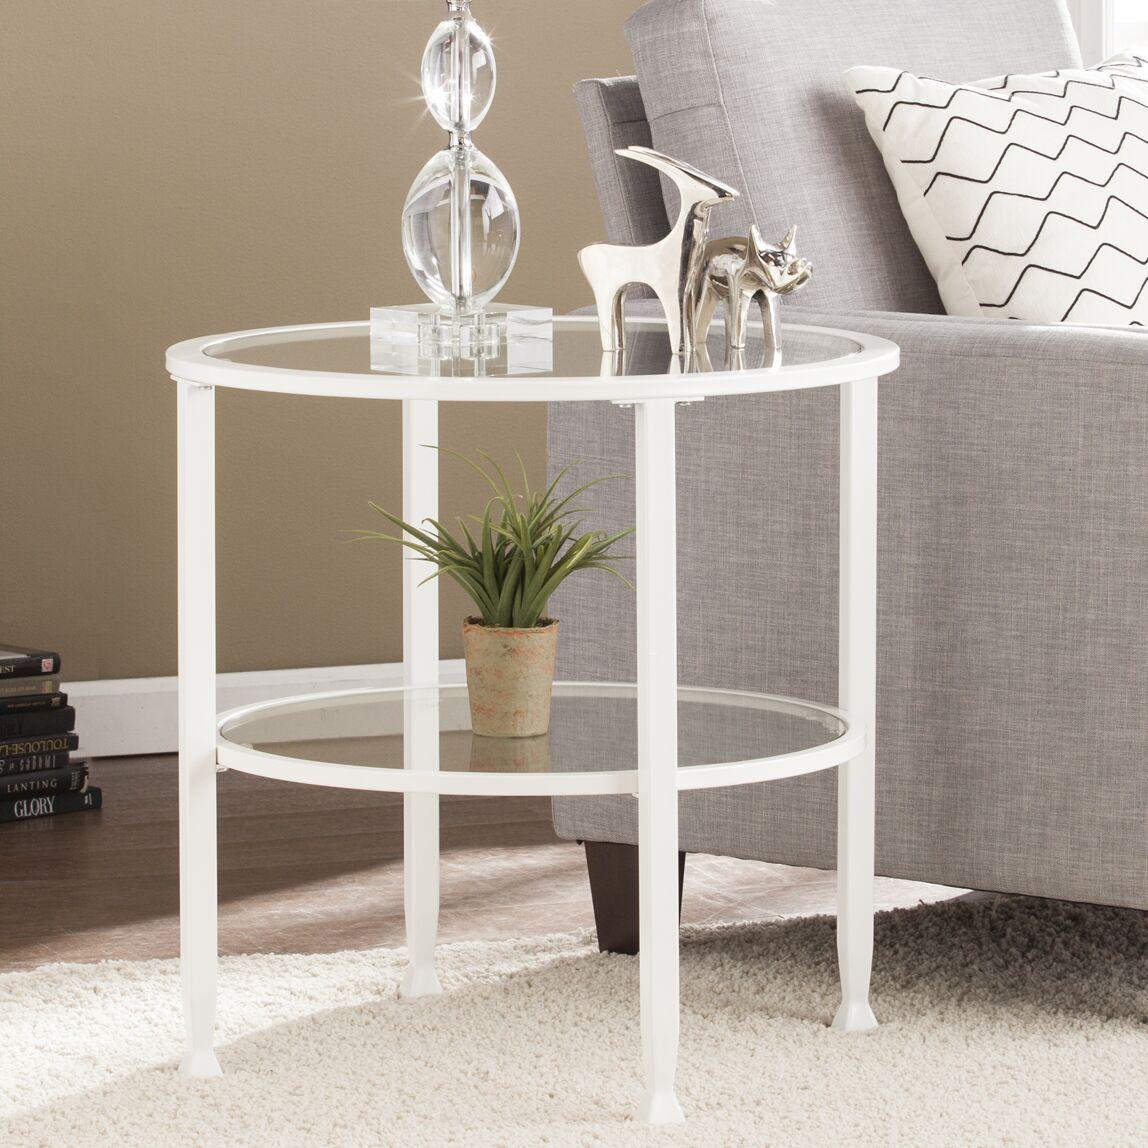 Casas End Table Color: White